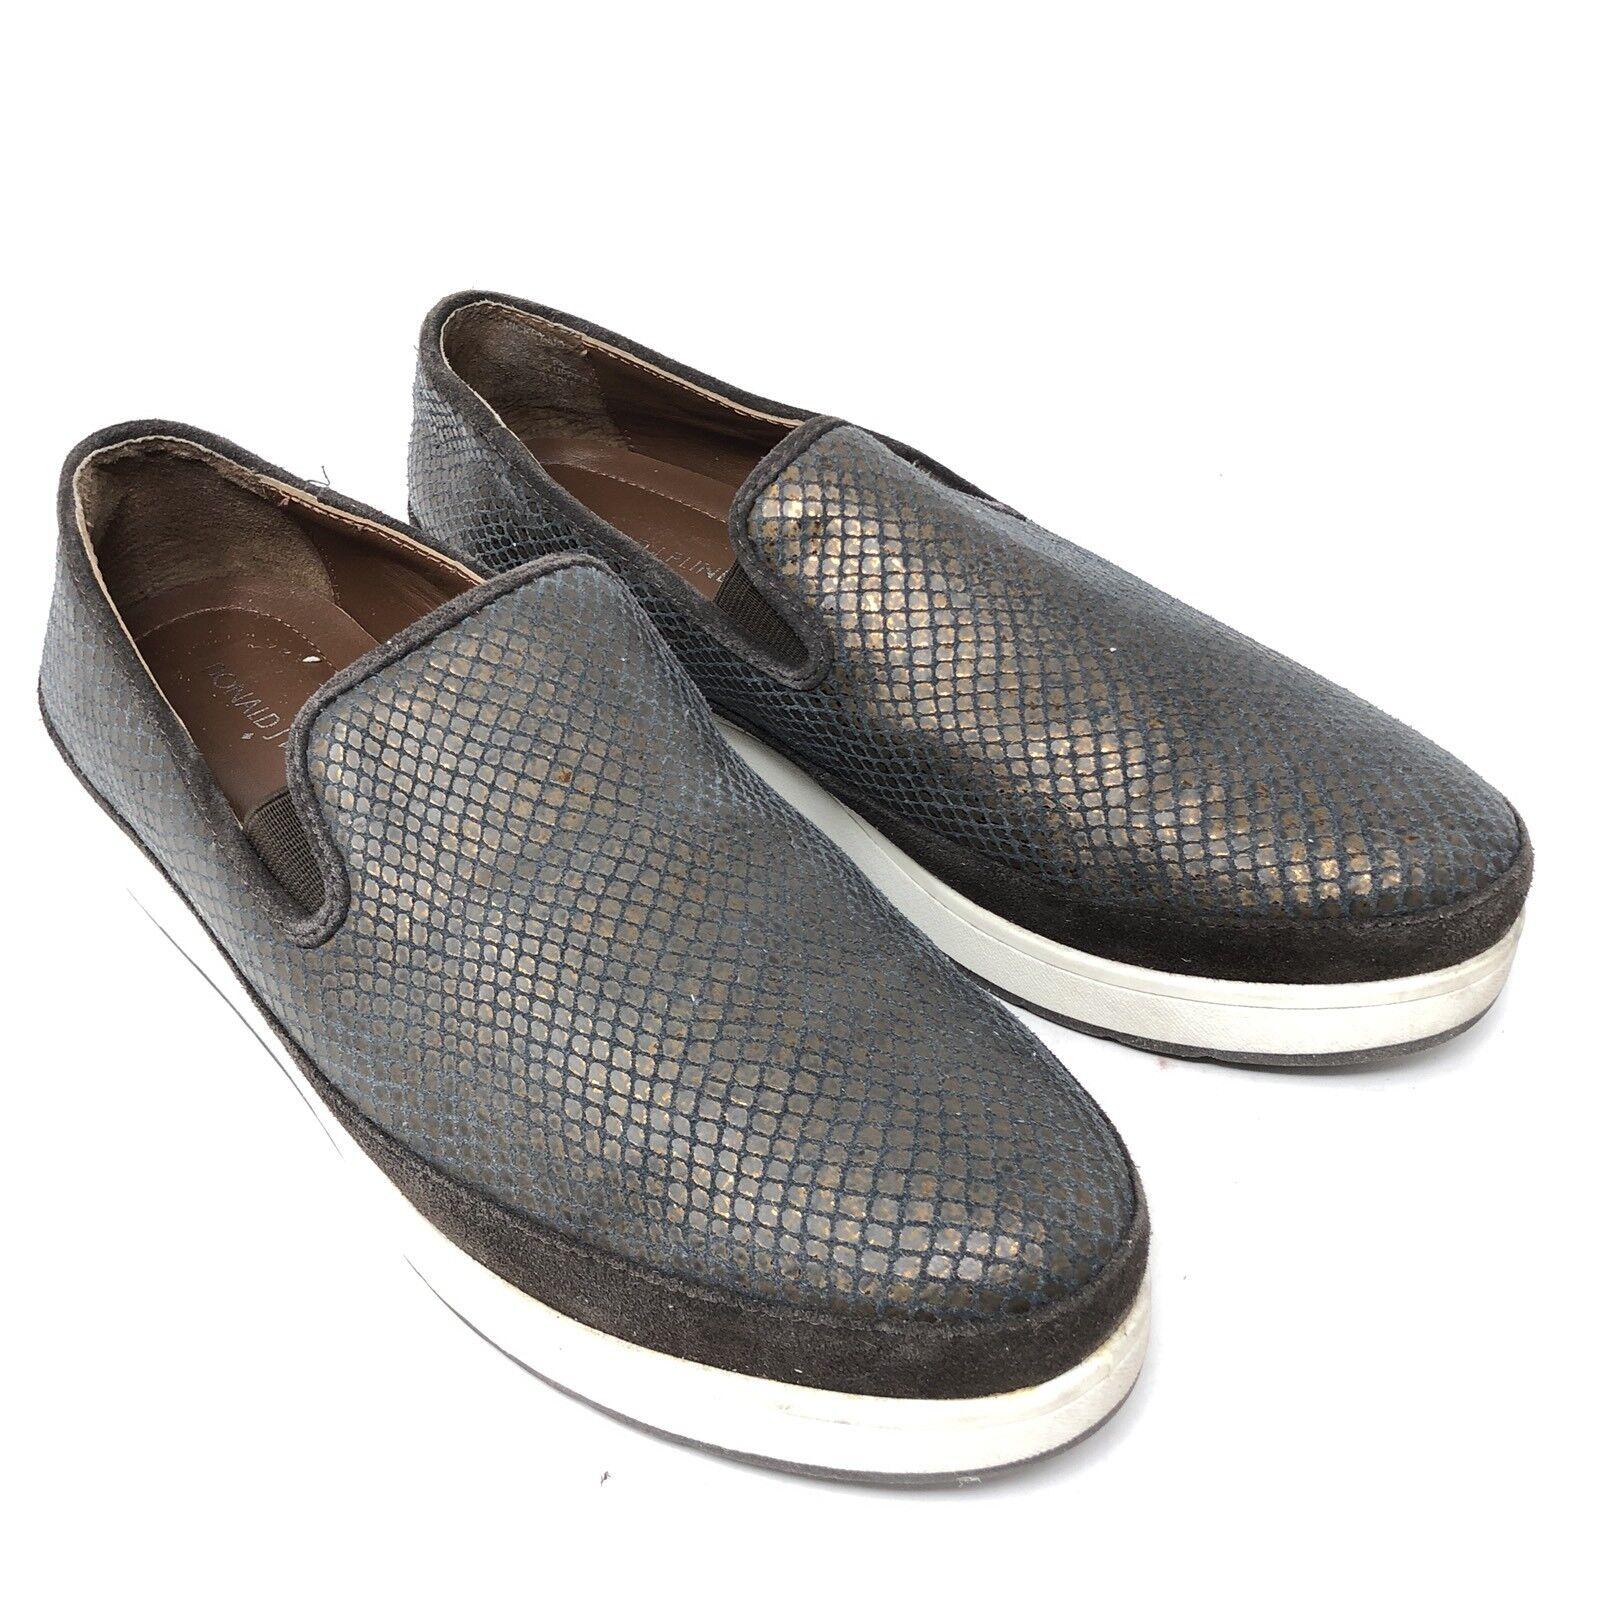 Donald J Pliner Mickey Mo Bronze Leather Snake Print Fashion Sneakers Womens 10M